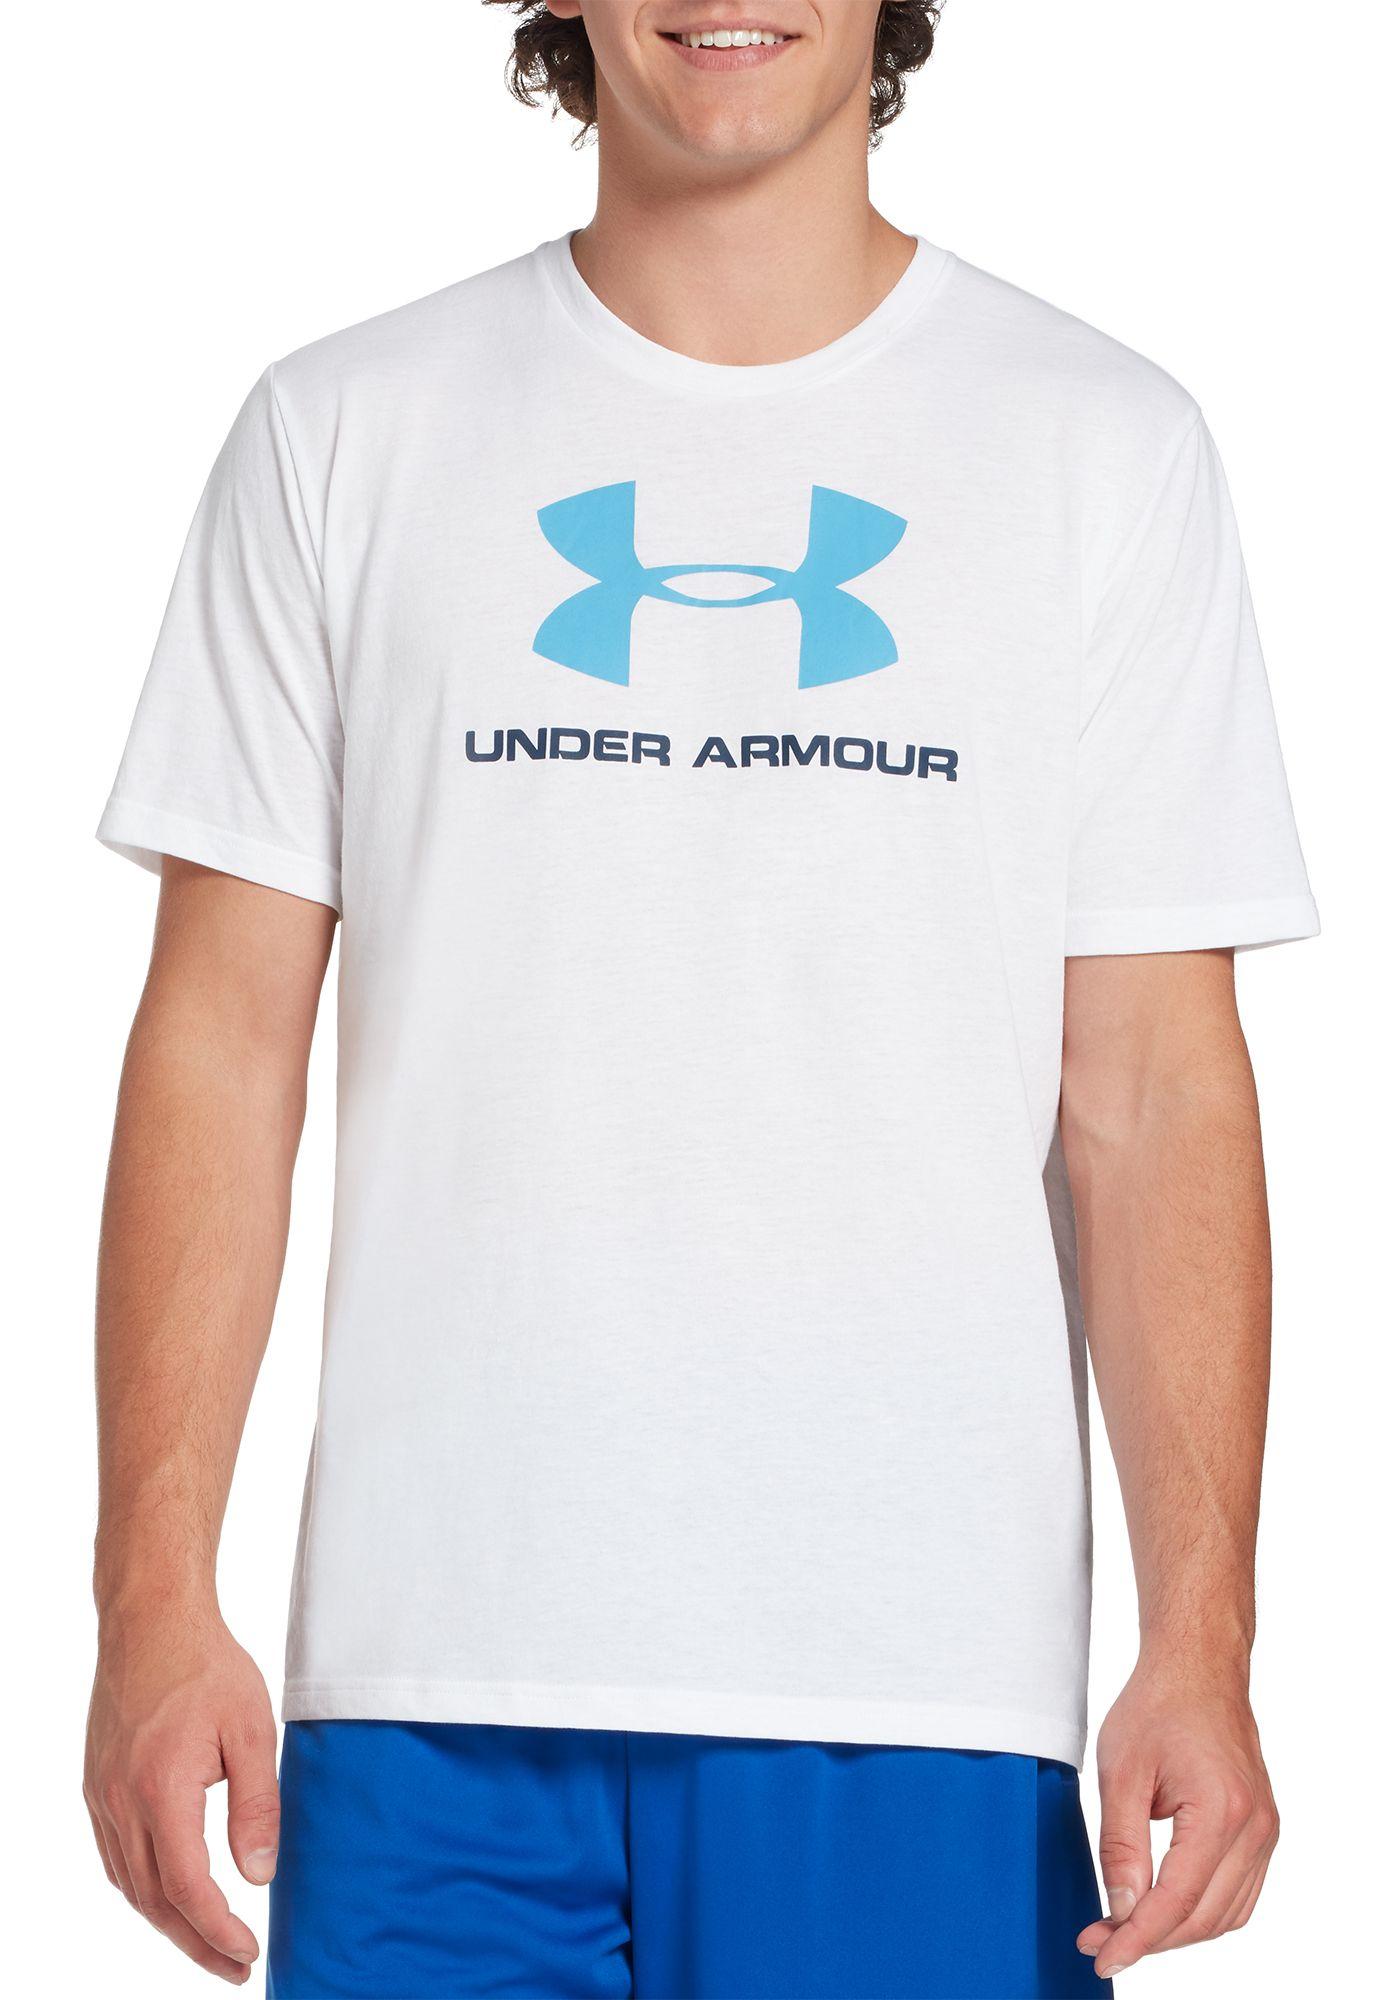 Under Armour Men's Sportstyle Big Logo Graphic T-Shirt